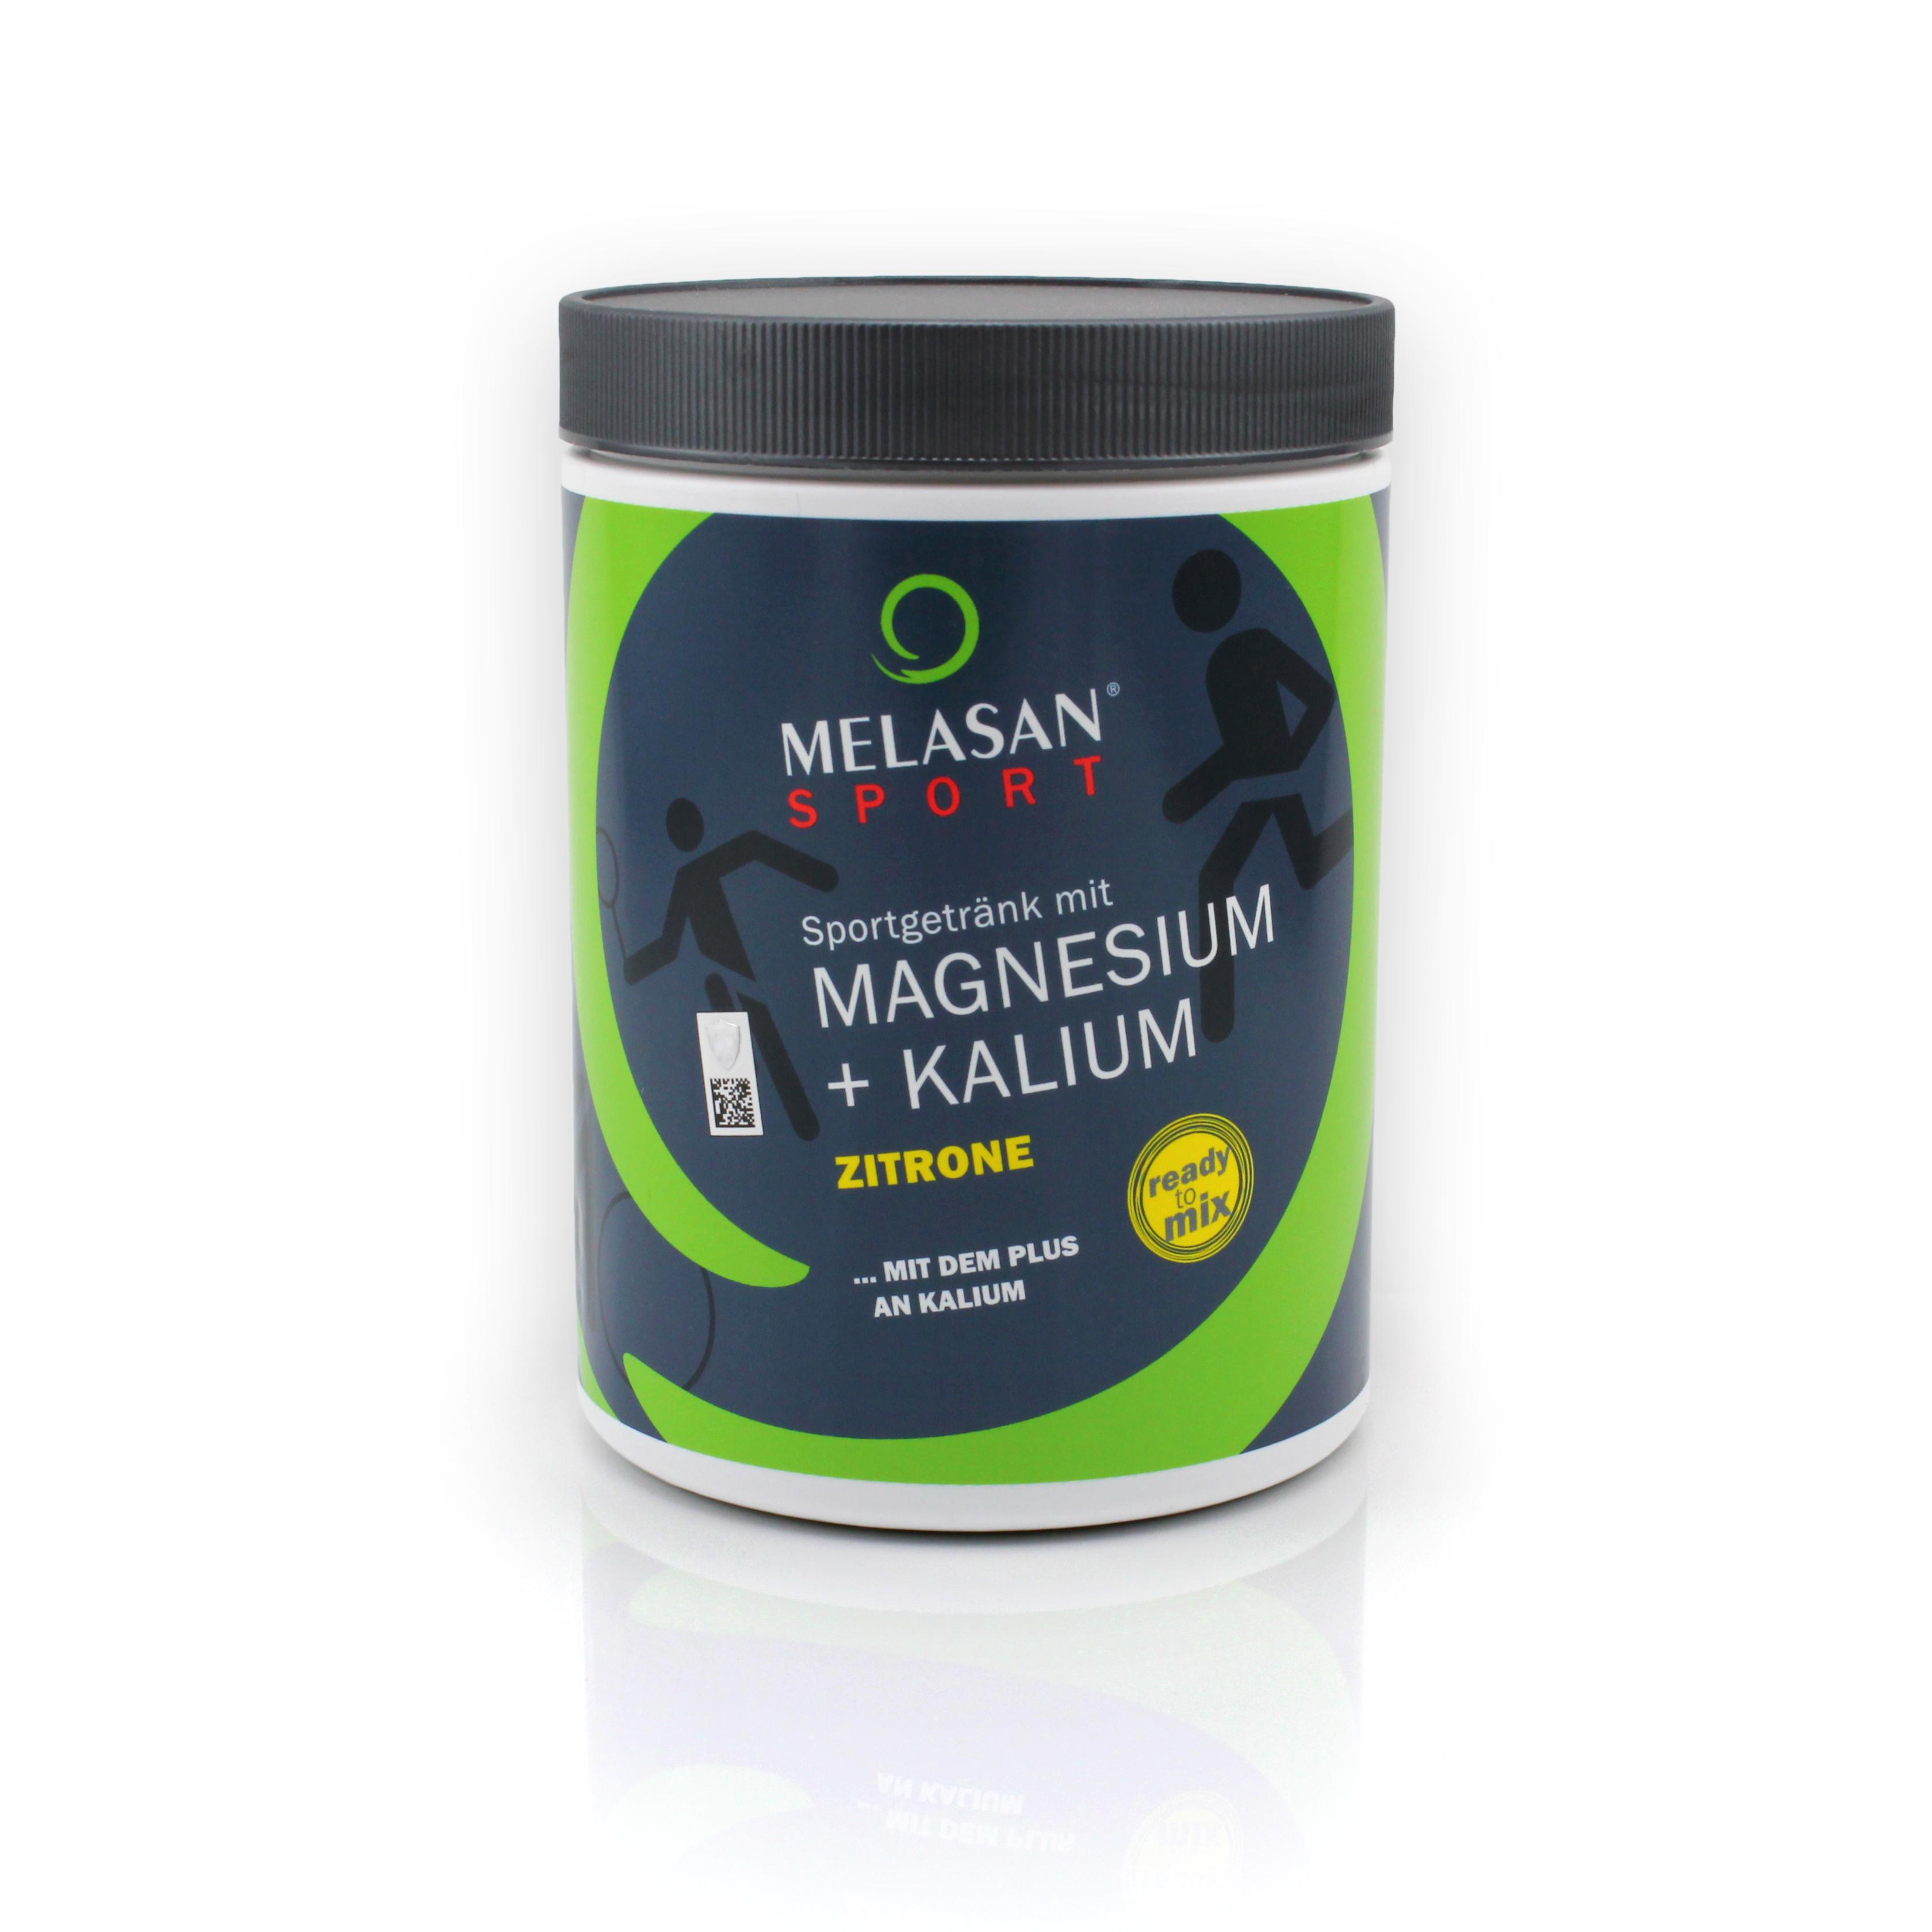 Melasan Sportgetränk Magnesium-Kalium ZITRONE